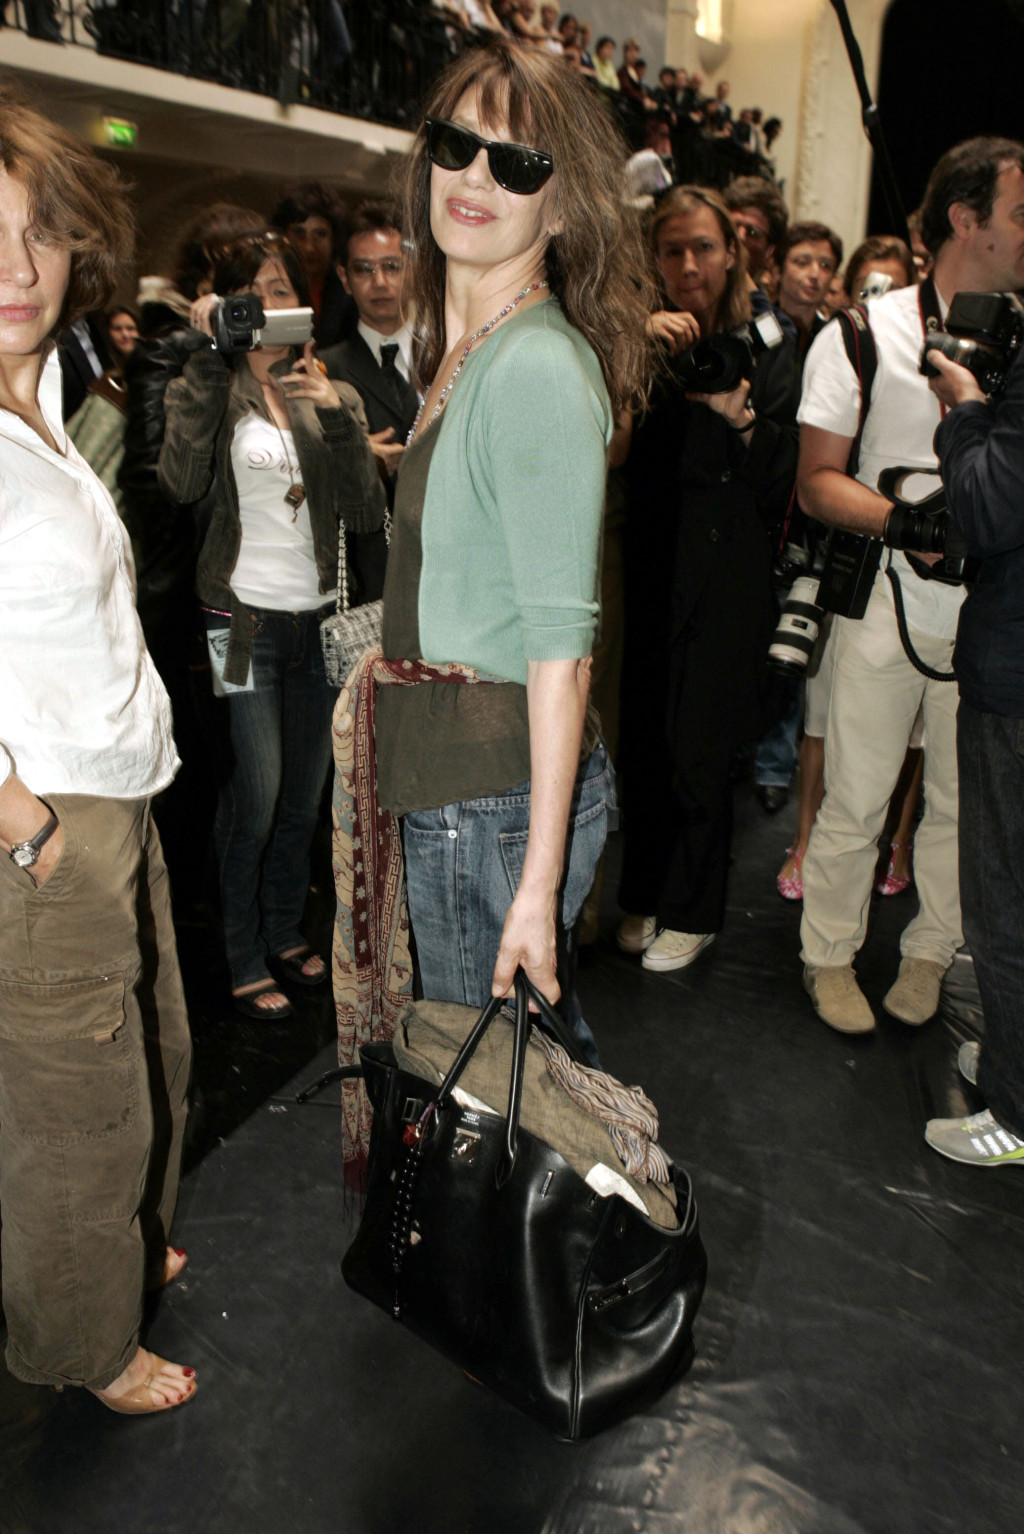 """Tweedland"" The Gentlemen's club: The Birkin bag by Hermès ..."